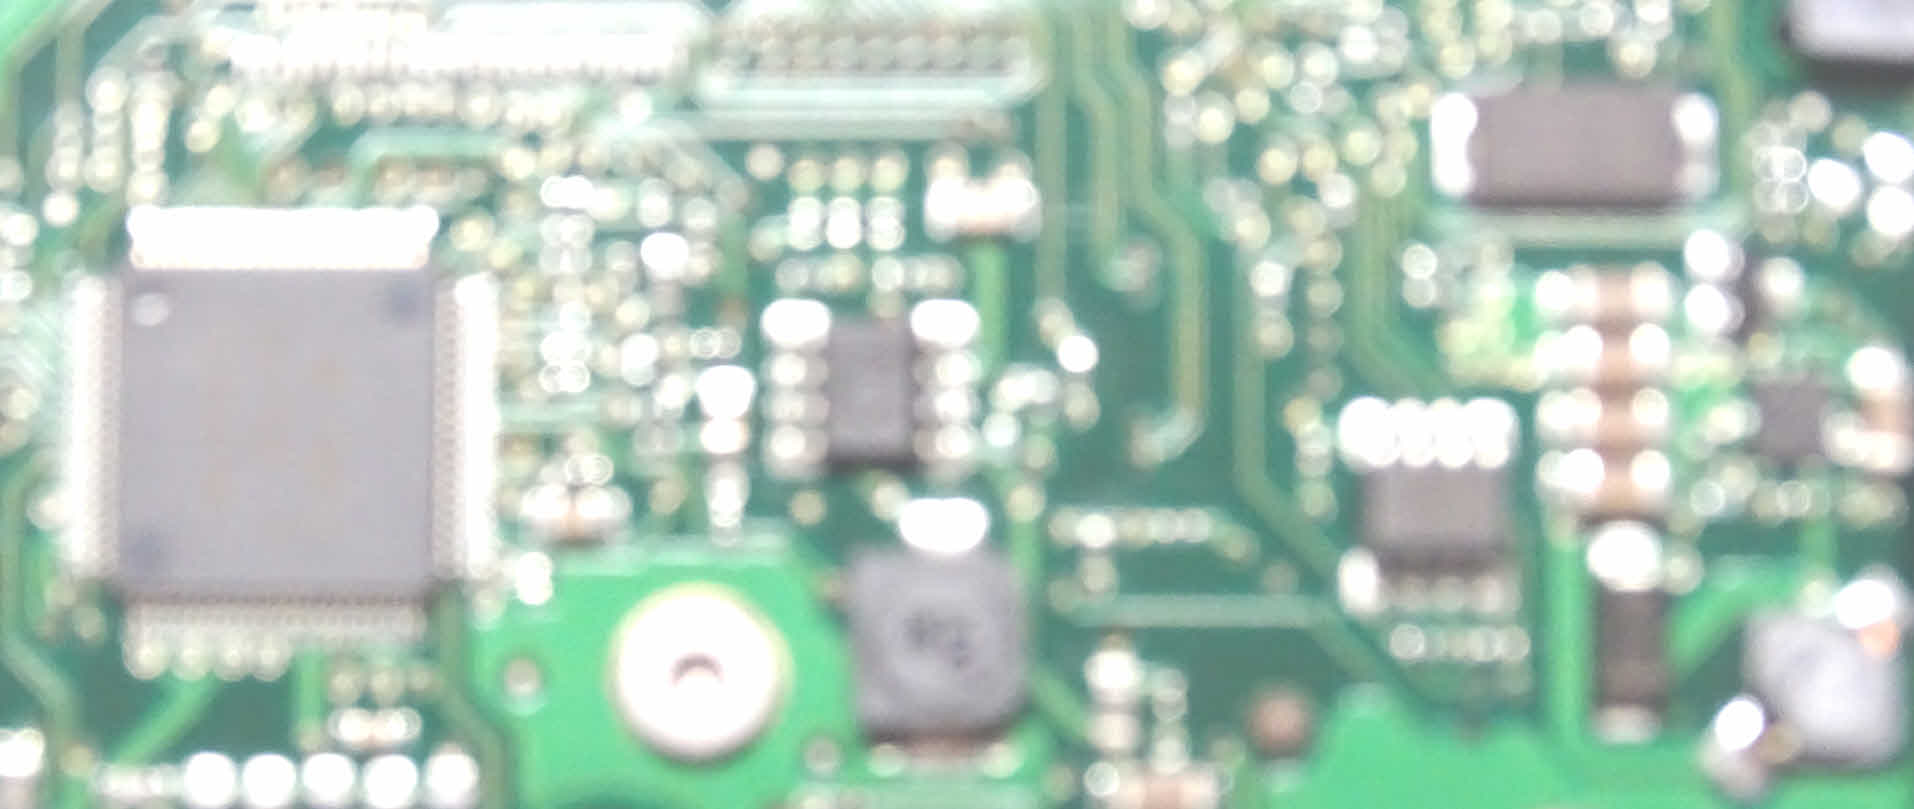 Hintergrund_elektronik_hell